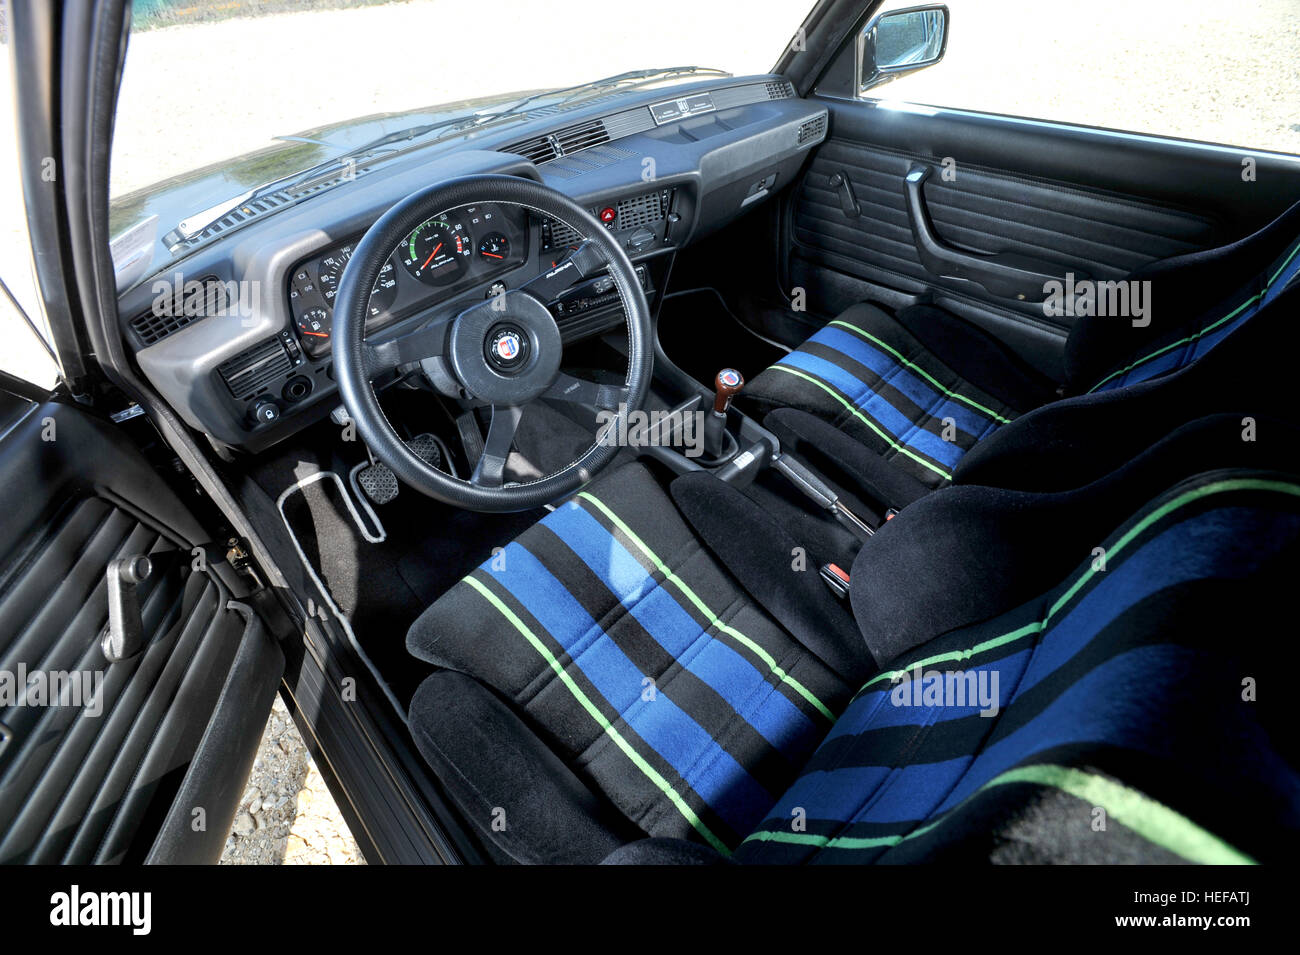 1983 Bmw E21 Shape Alpina B6 Sports Coupe German Classic